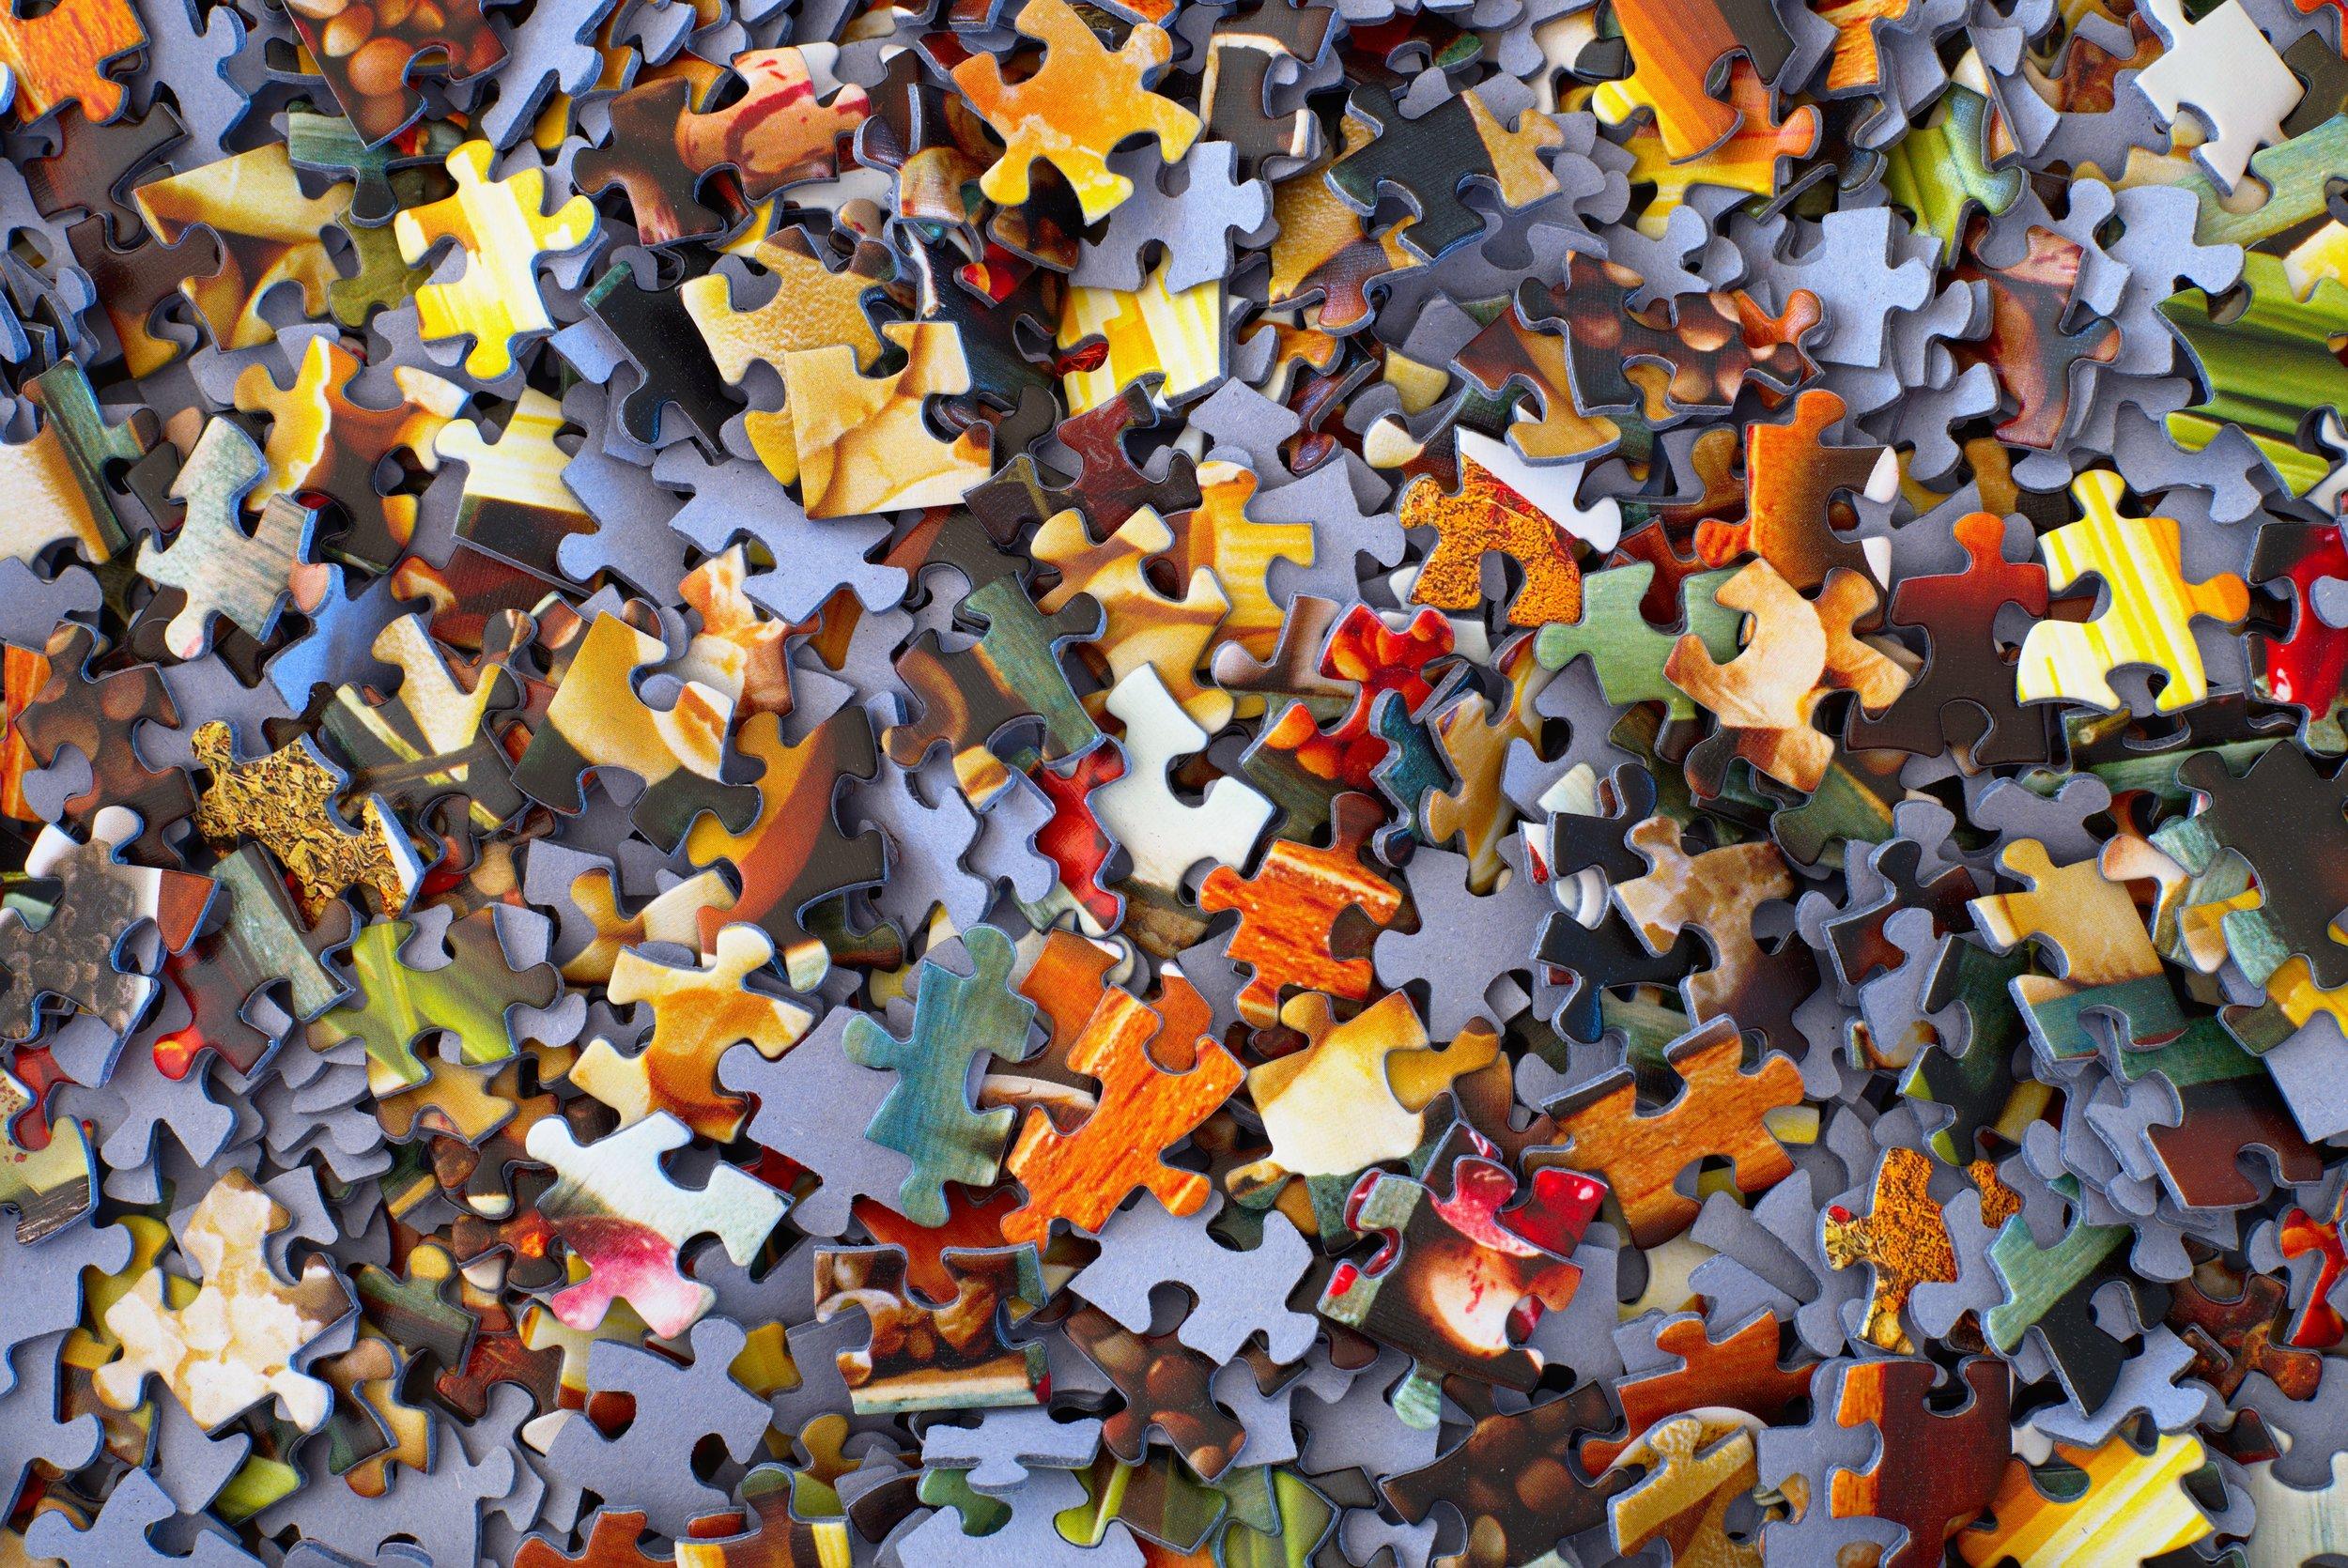 puzzle hans-peter-gauster-252751-unsplash.jpg